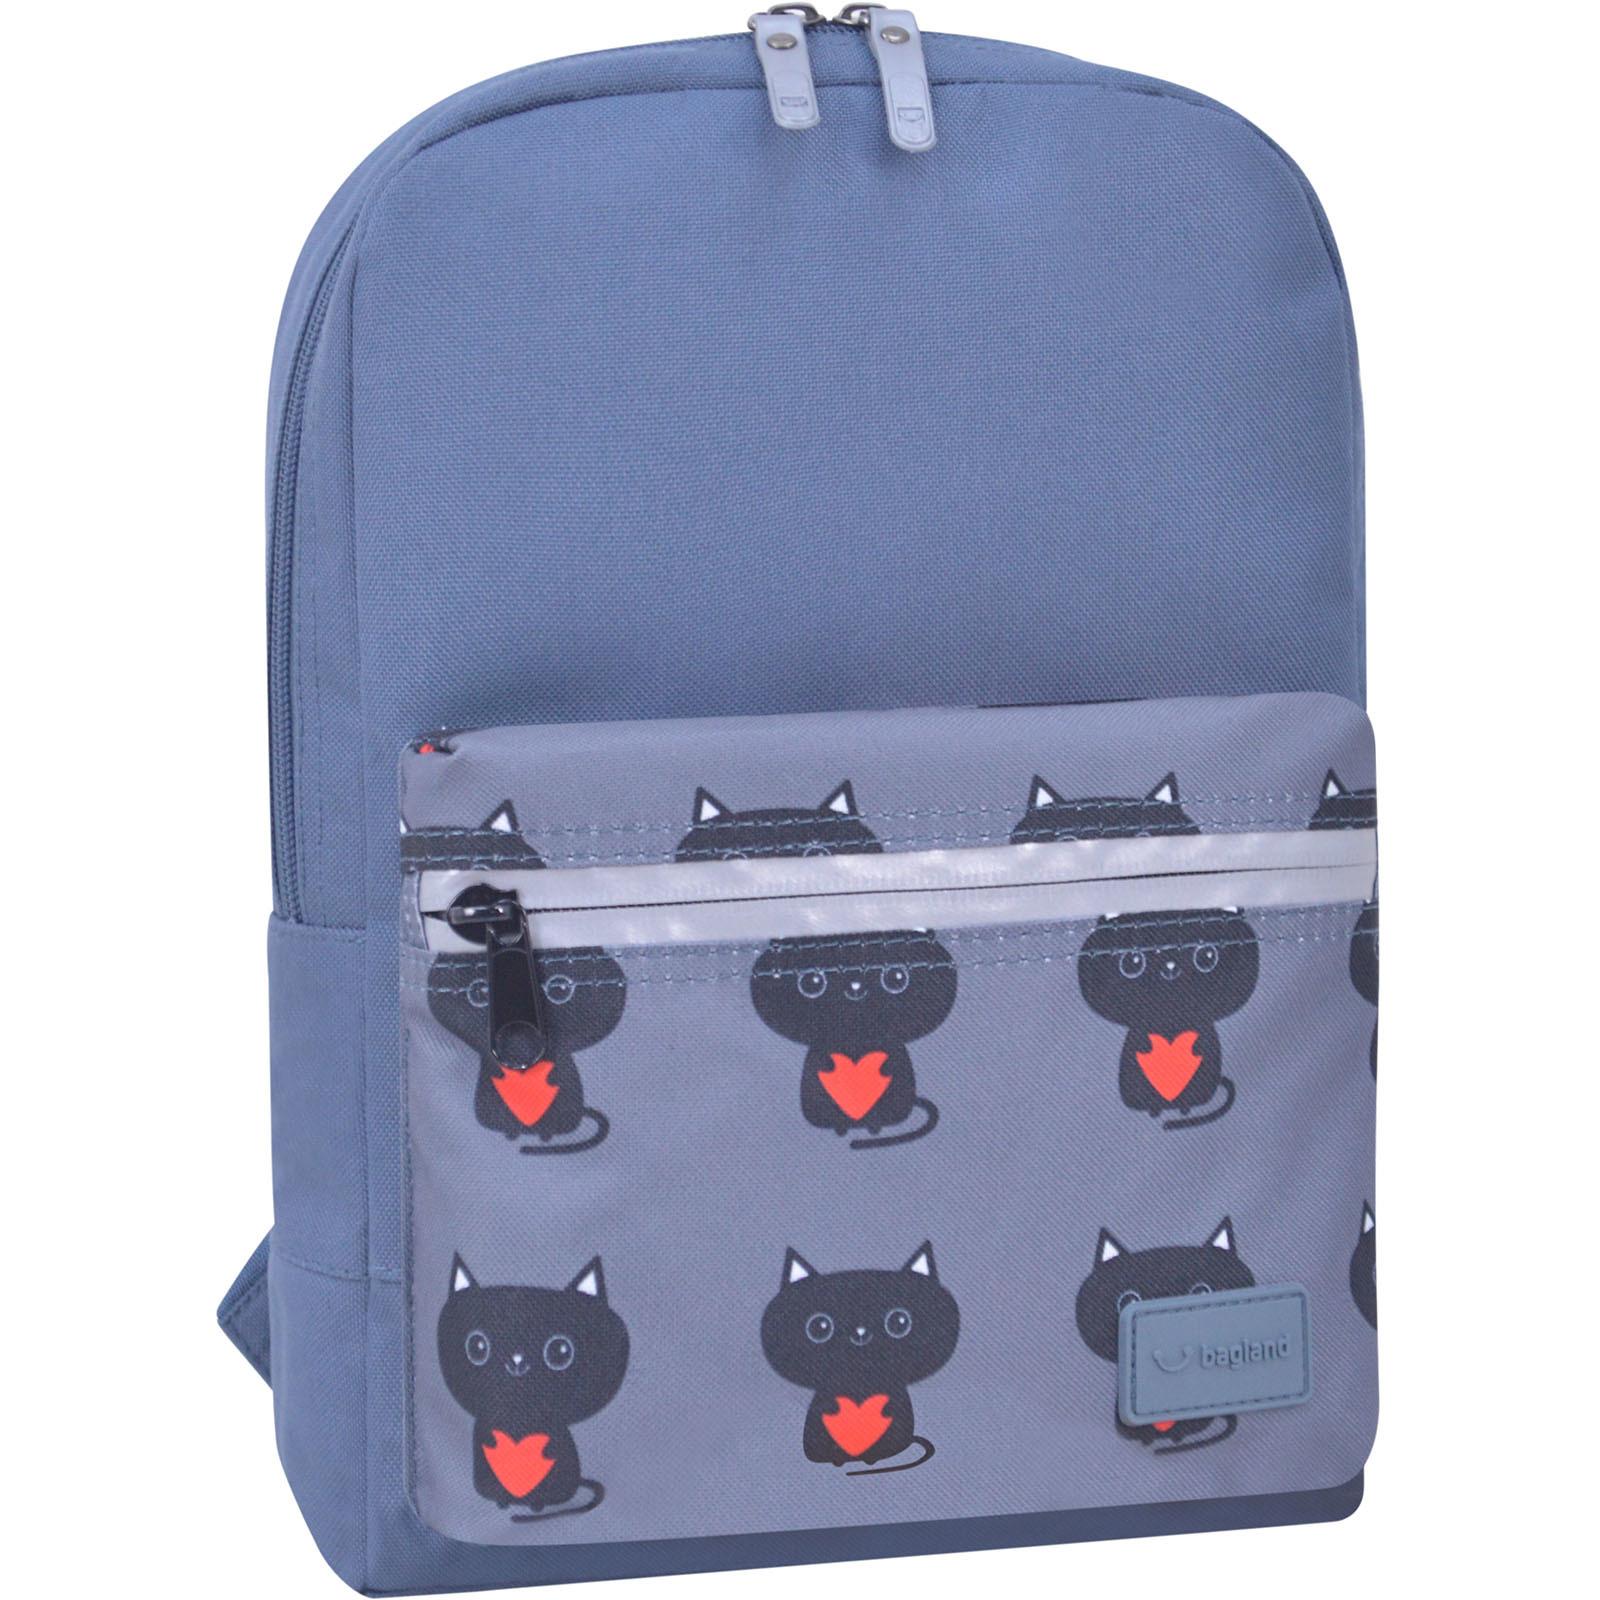 Детские рюкзаки Рюкзак Bagland Молодежный mini 8 л. серый 750 (0050866) DSC_1158_суб750_-1600.jpg